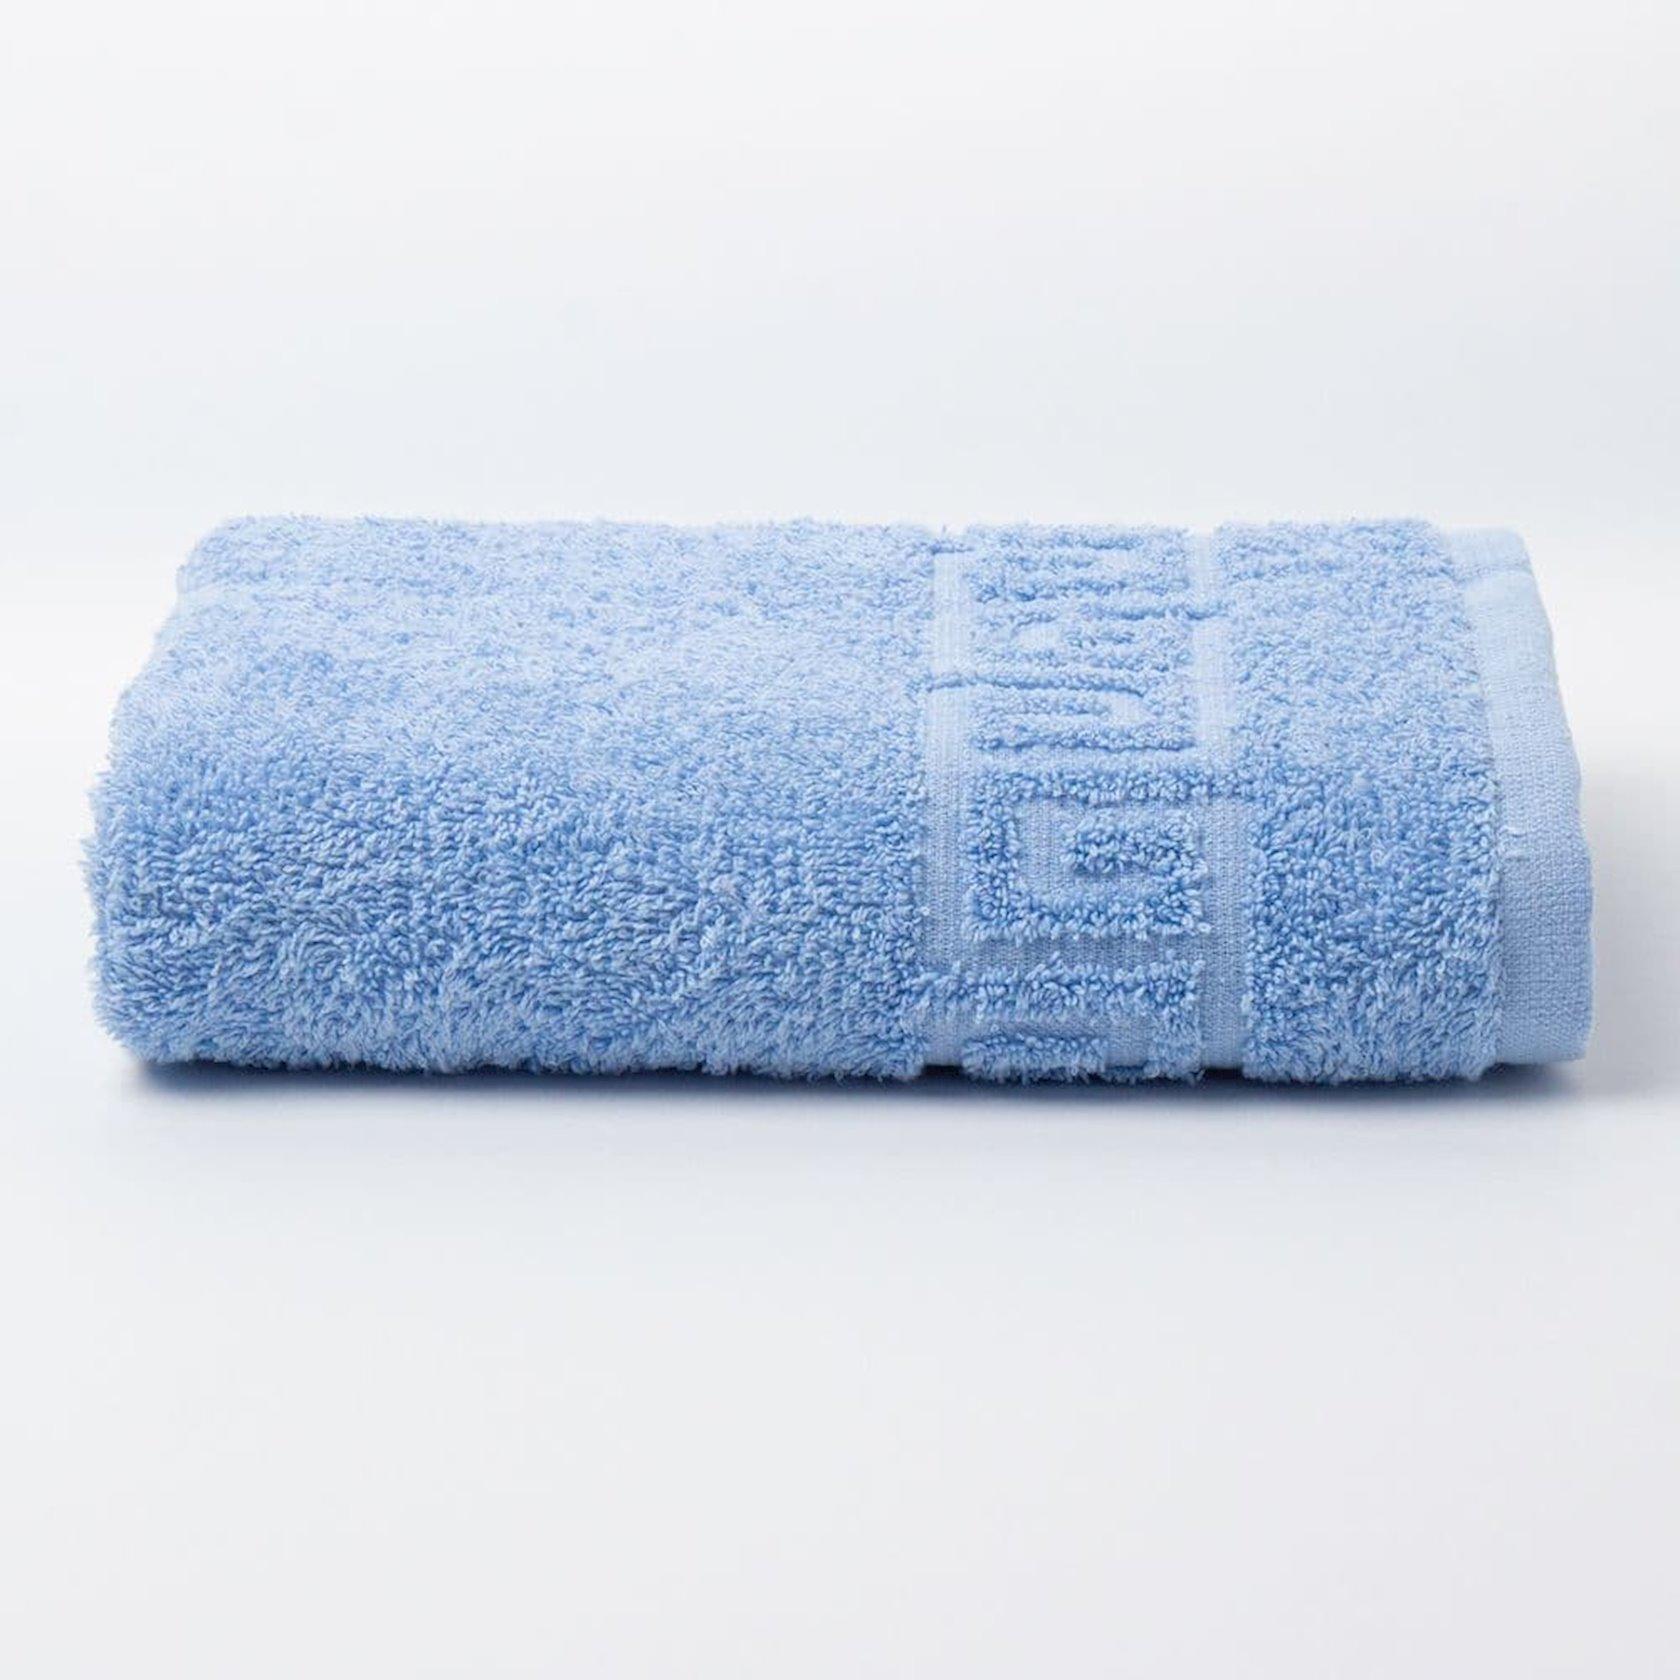 Dəsmal ADT Cashemere blue 50x90, sıxlıq 430 qr/m²